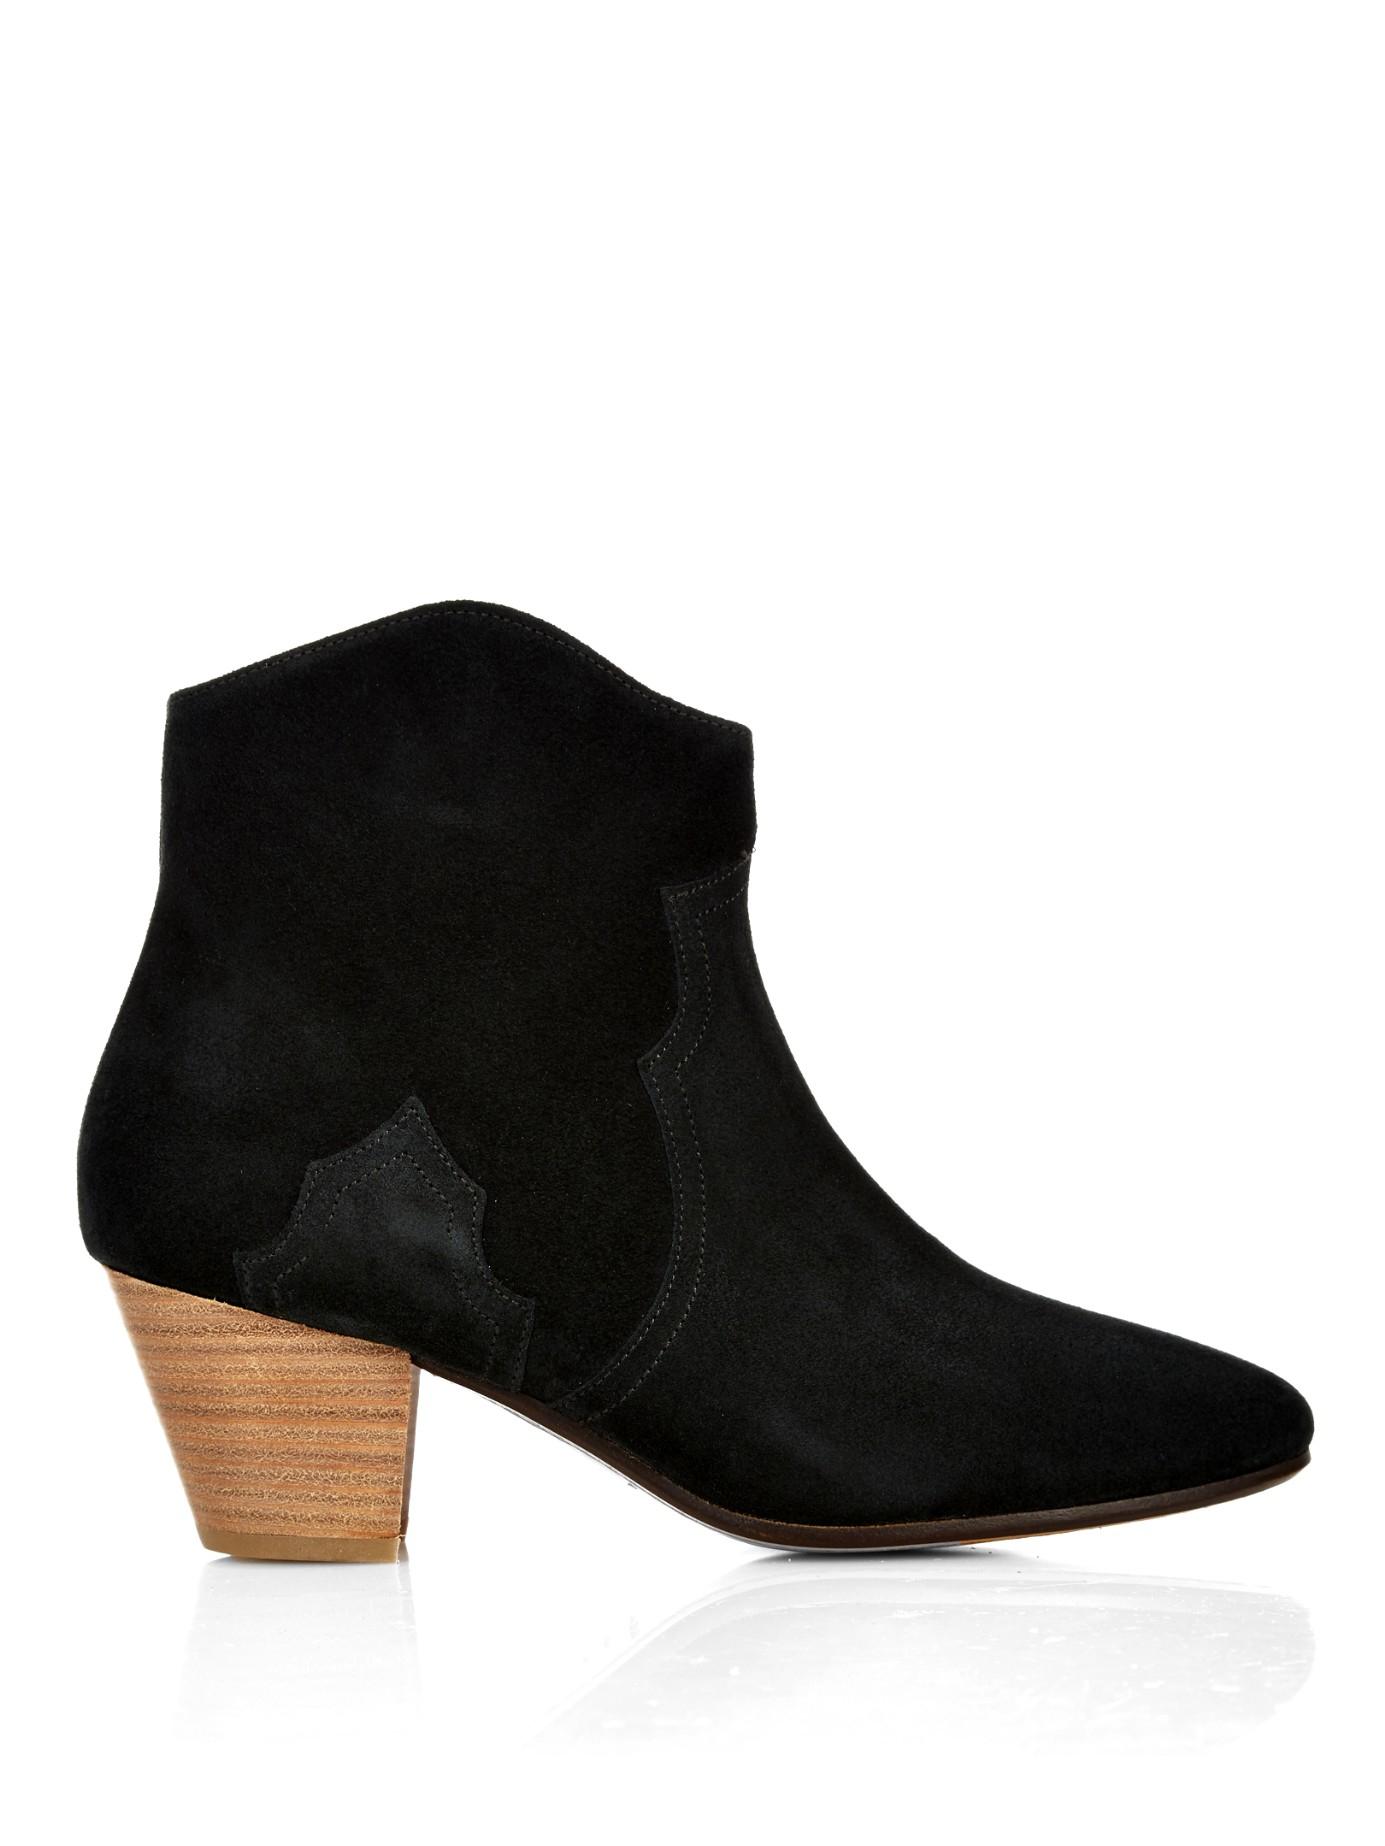 isabel marant toile dicker suede boots in black lyst. Black Bedroom Furniture Sets. Home Design Ideas